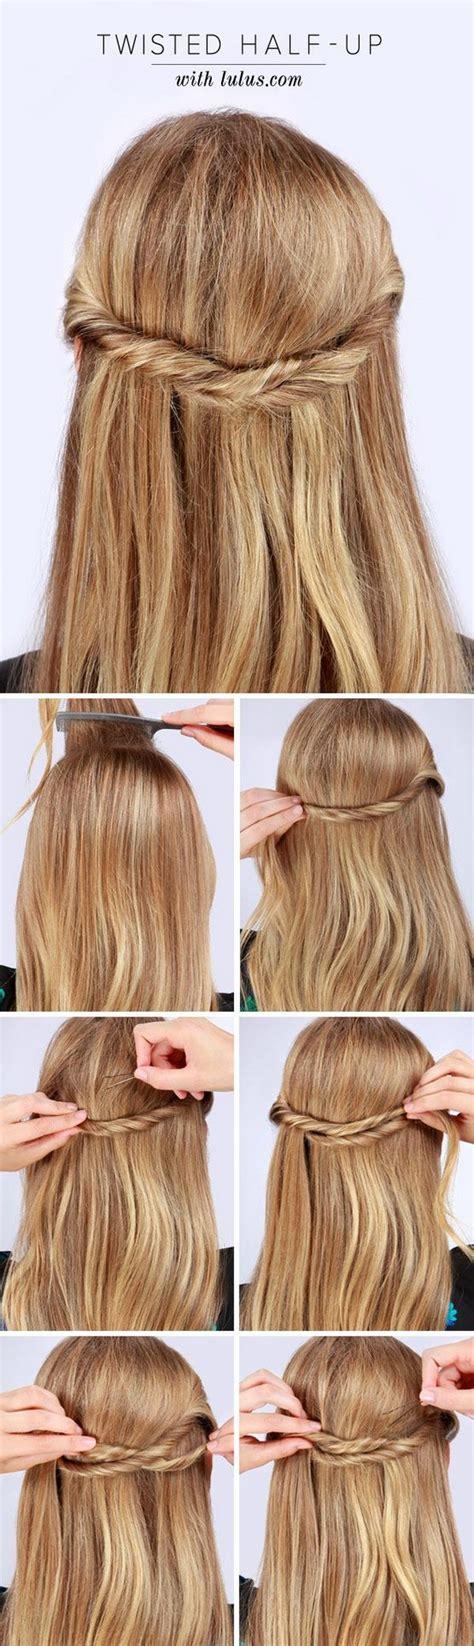 diy half up half down hairstyles pinterest 55 stunning half up half down hairstyles